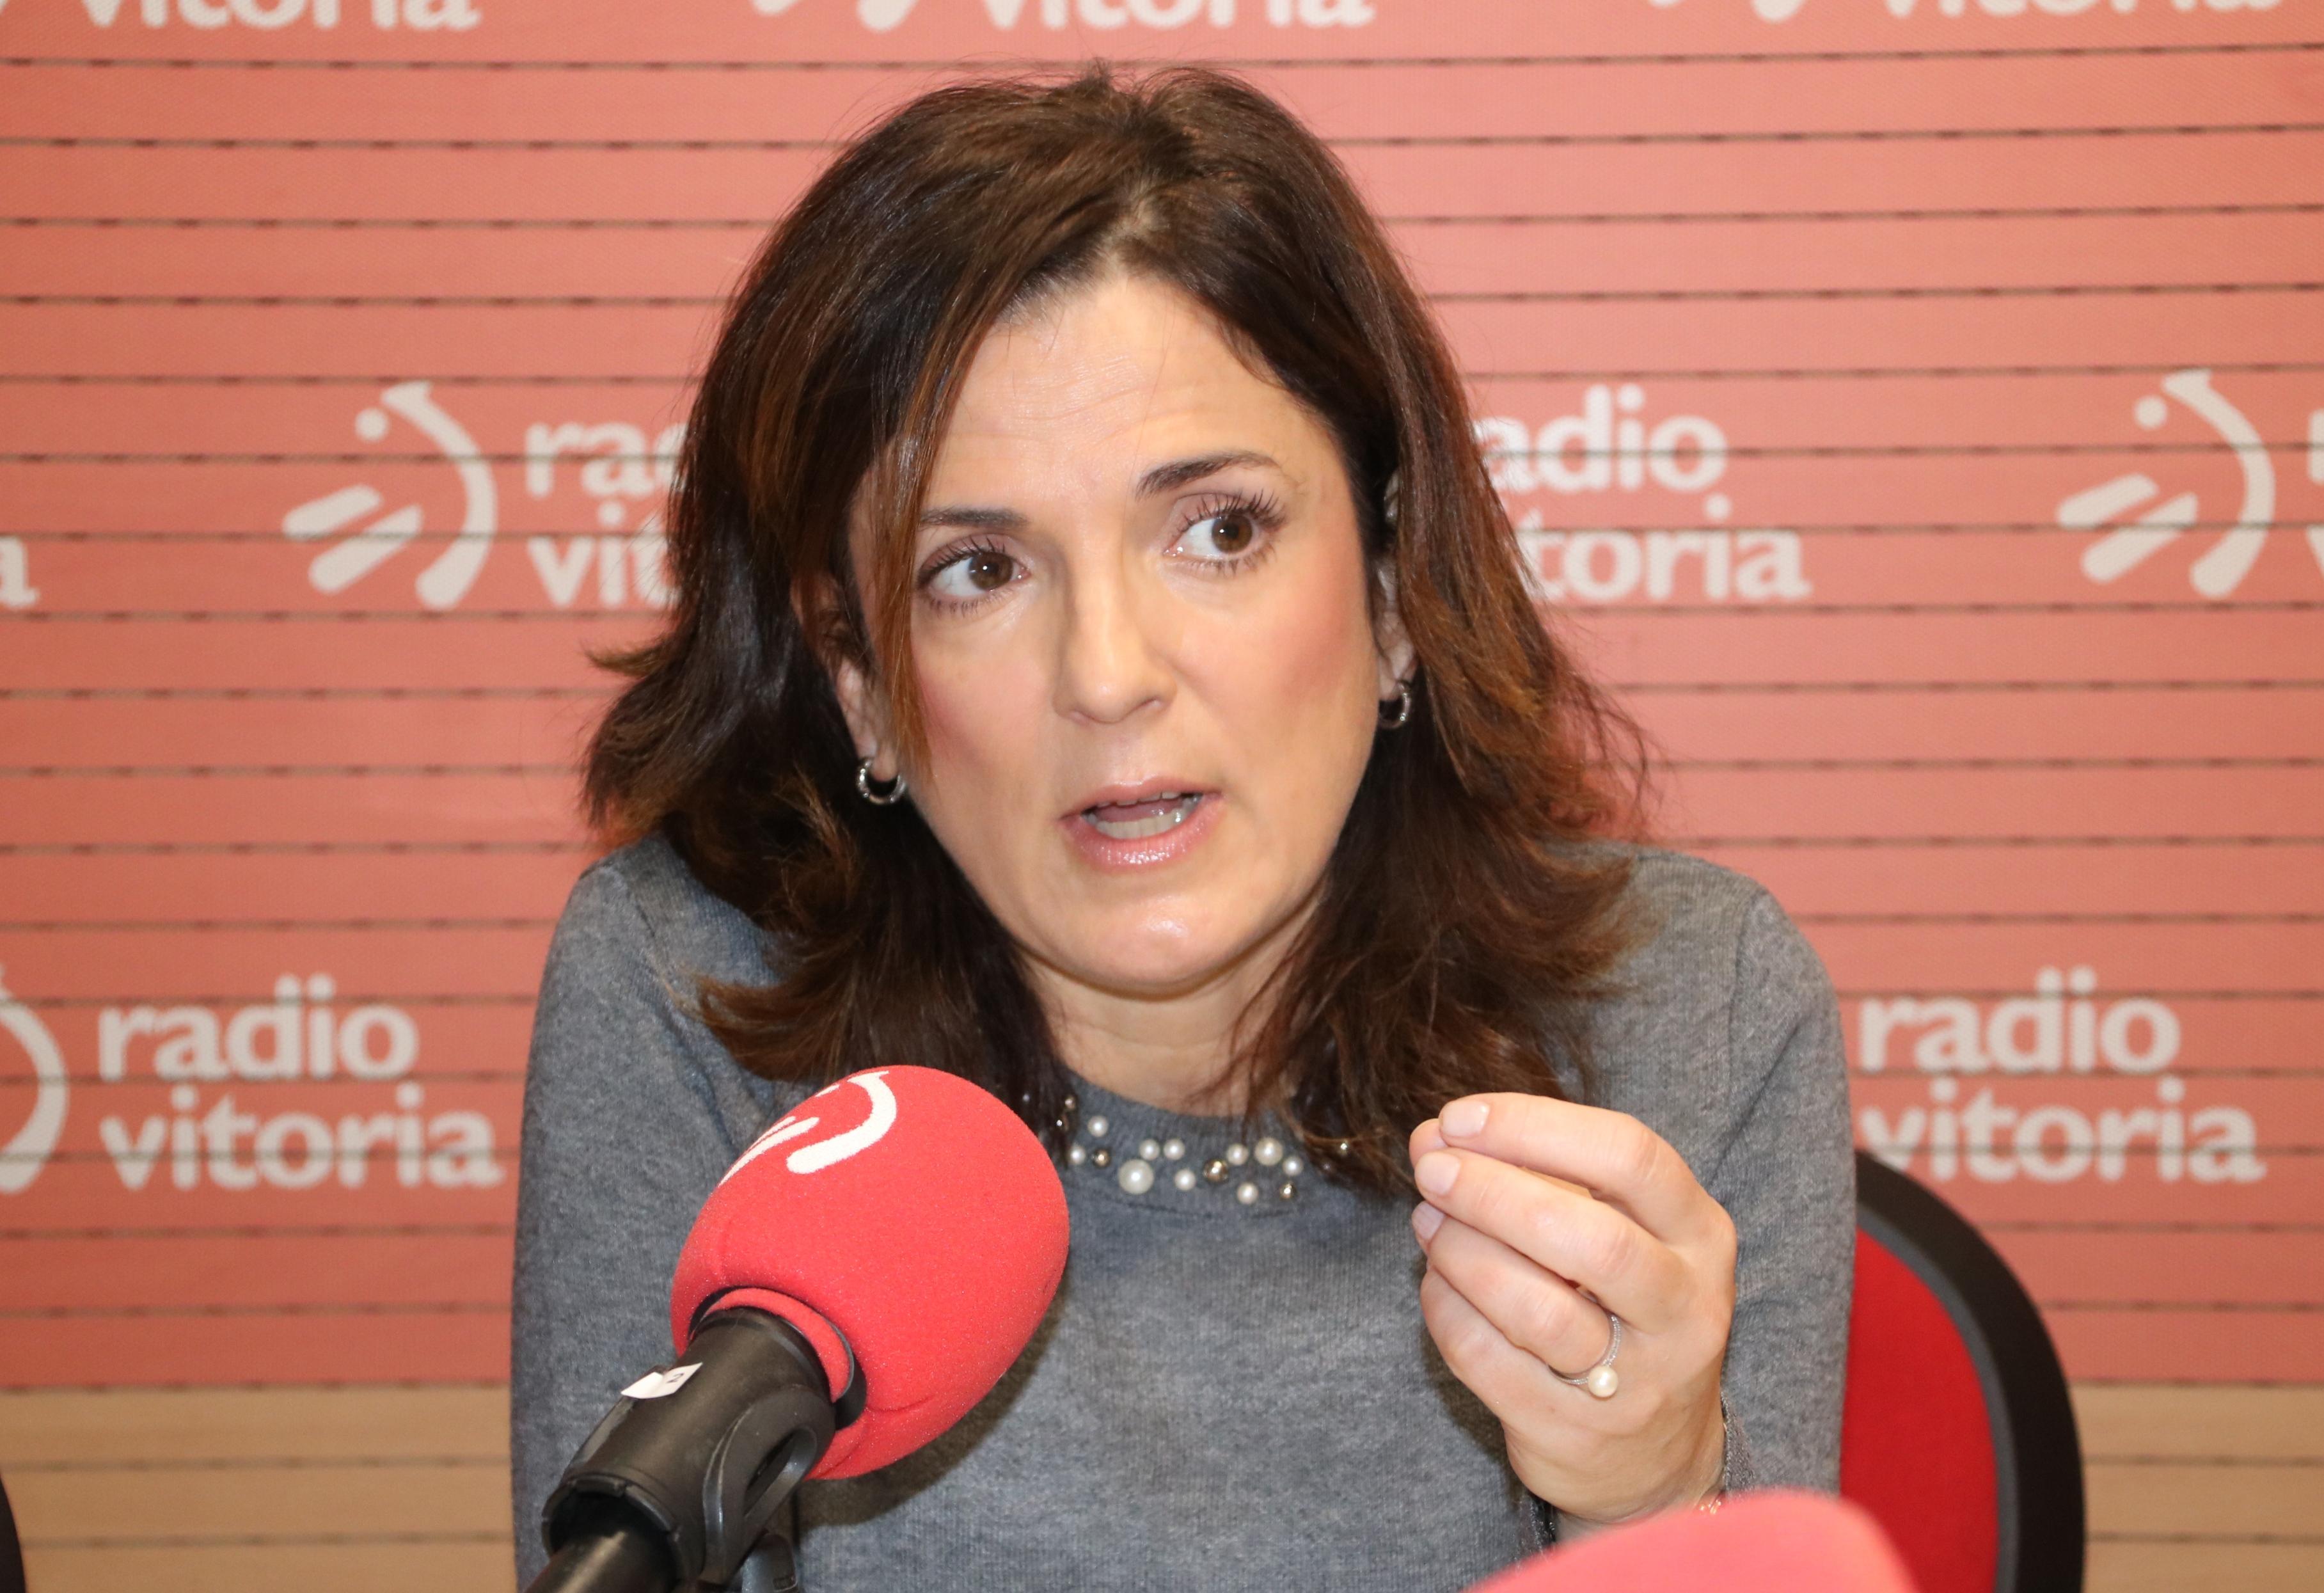 09_01_19_Radio_Vitoria__13_.JPG